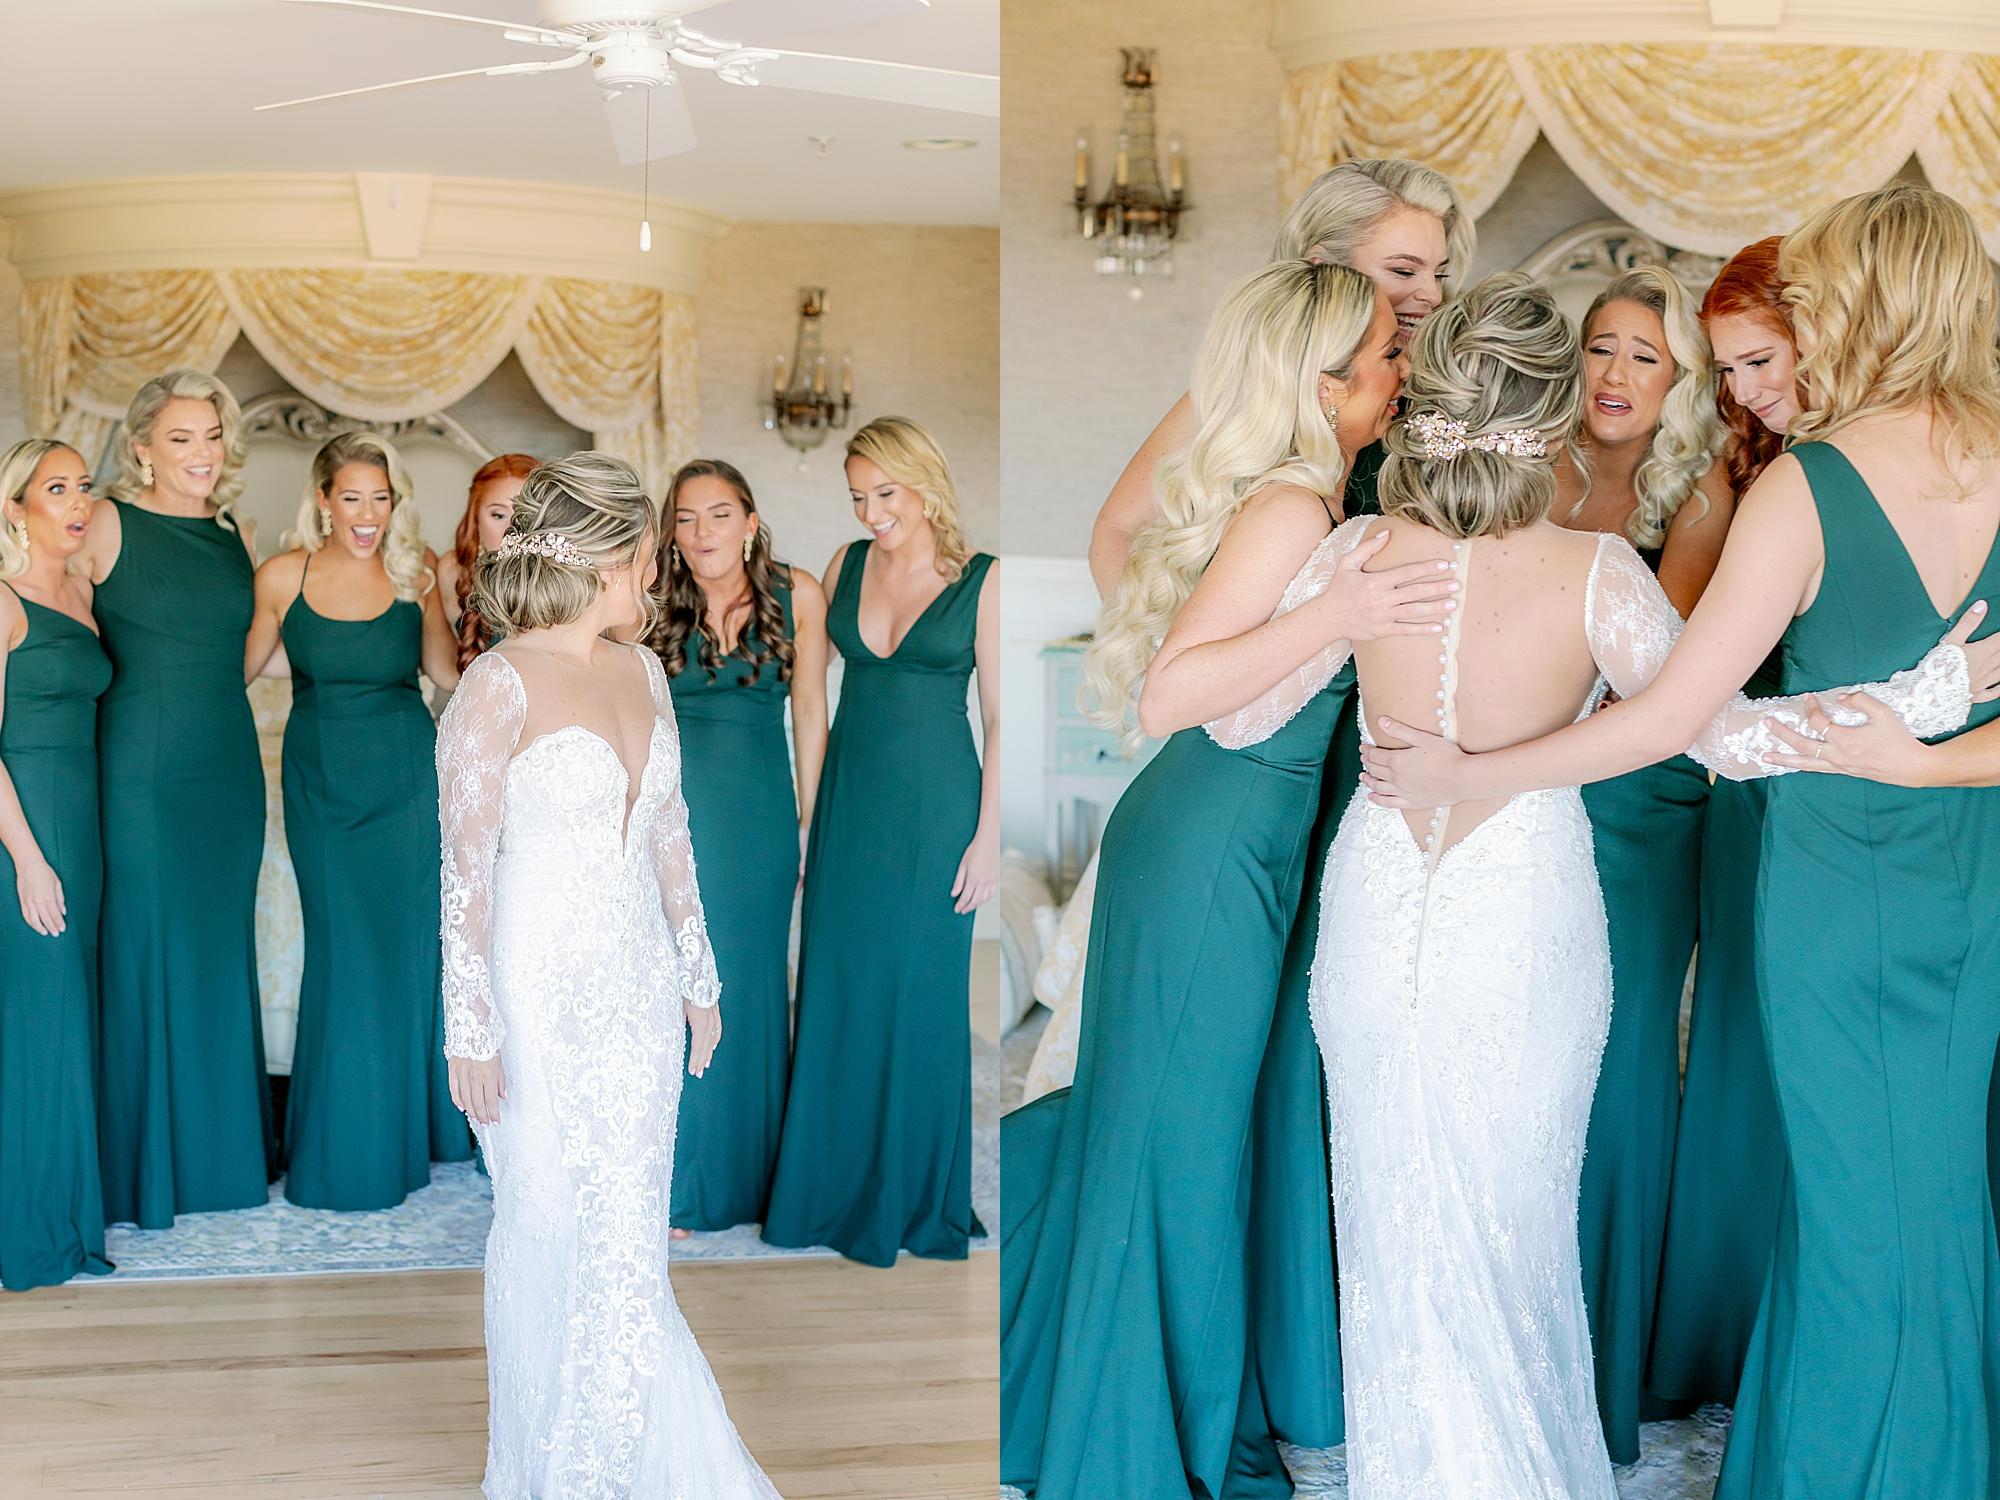 Bonnet Island Estate Film Wedding Photography by Magdalena Studios 0020